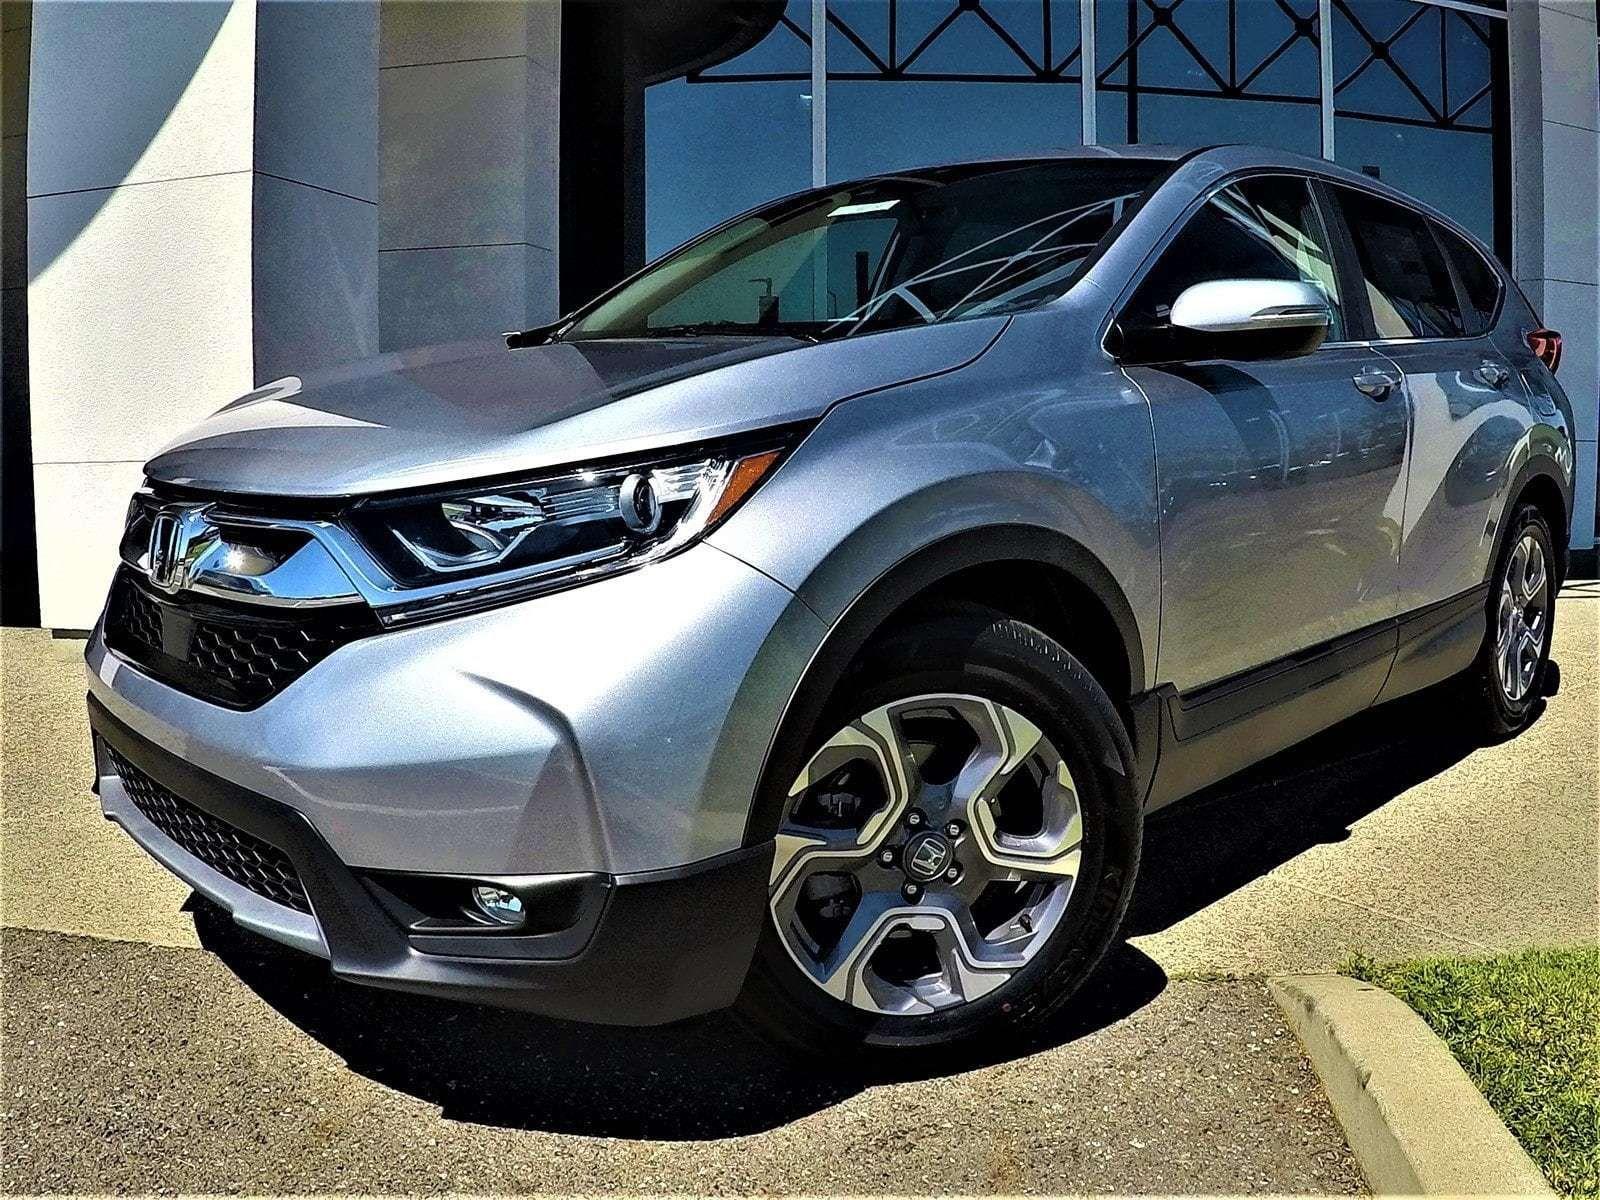 2017 Honda CRV Lease Specials (With images) Honda cr